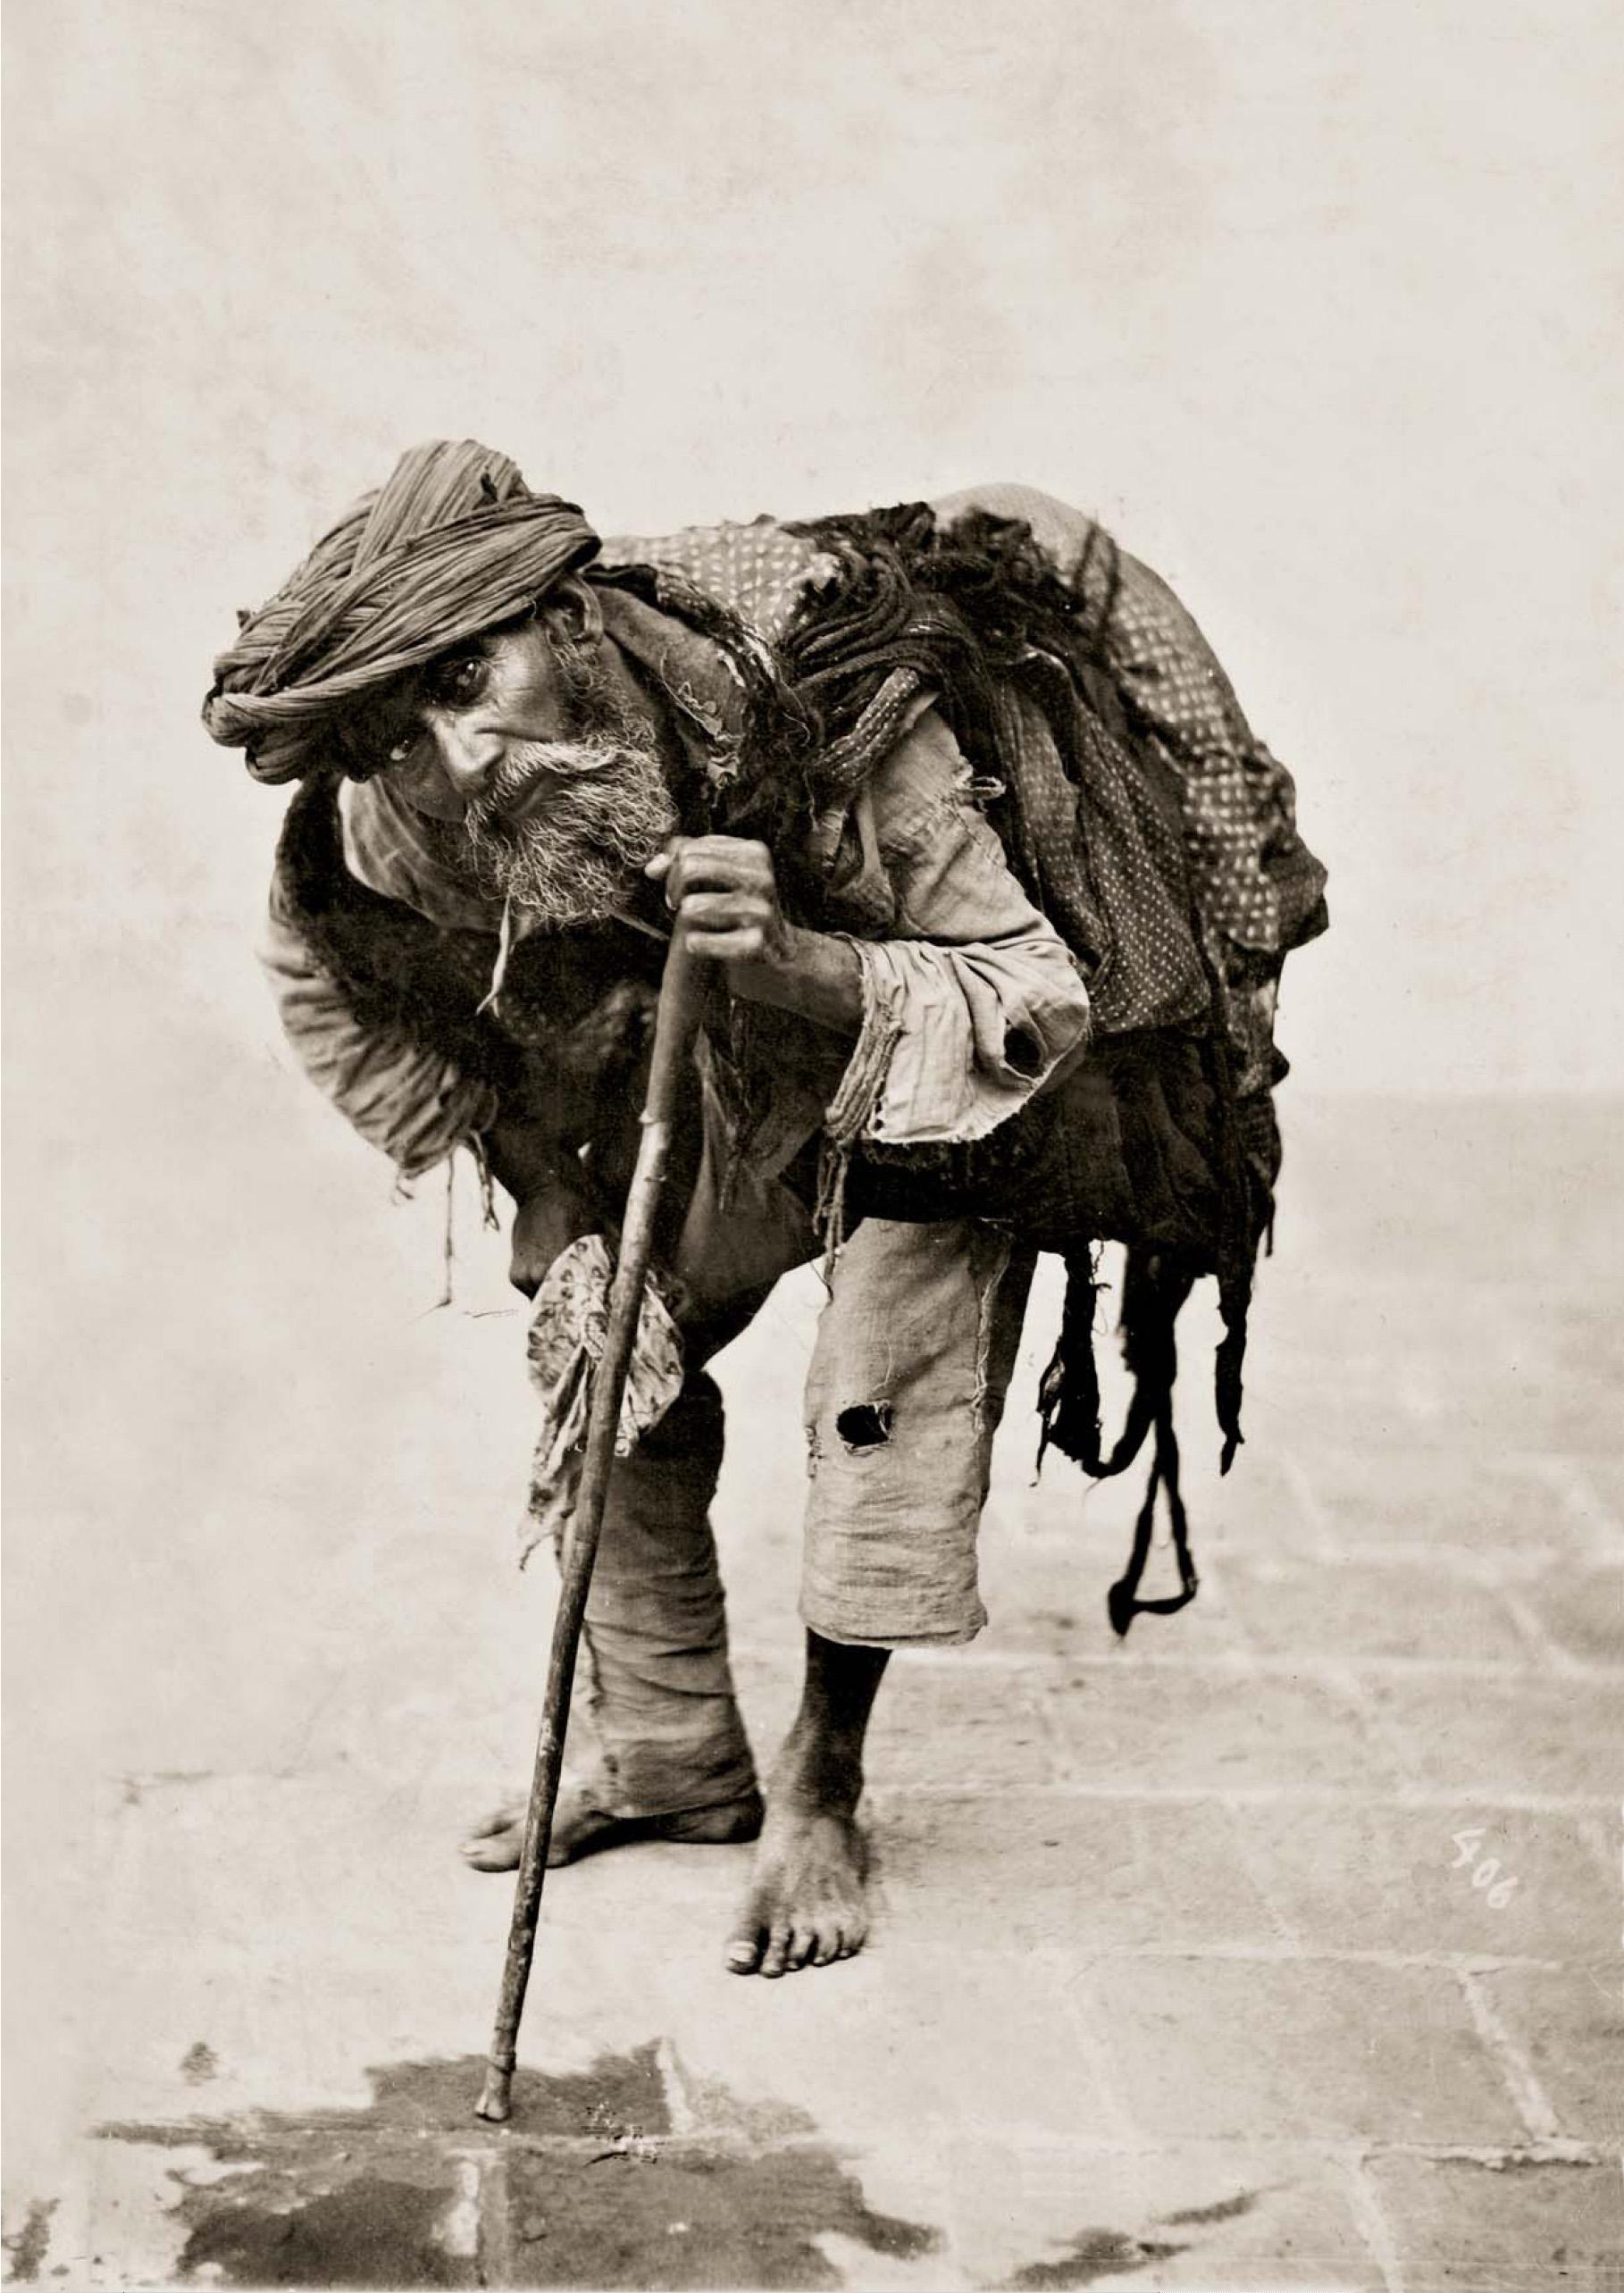 beggars on the street essay 静音・低消費電力かつコンパクト設計のエアーポンプ、浄化槽・燃料電池用ブロワ製造.